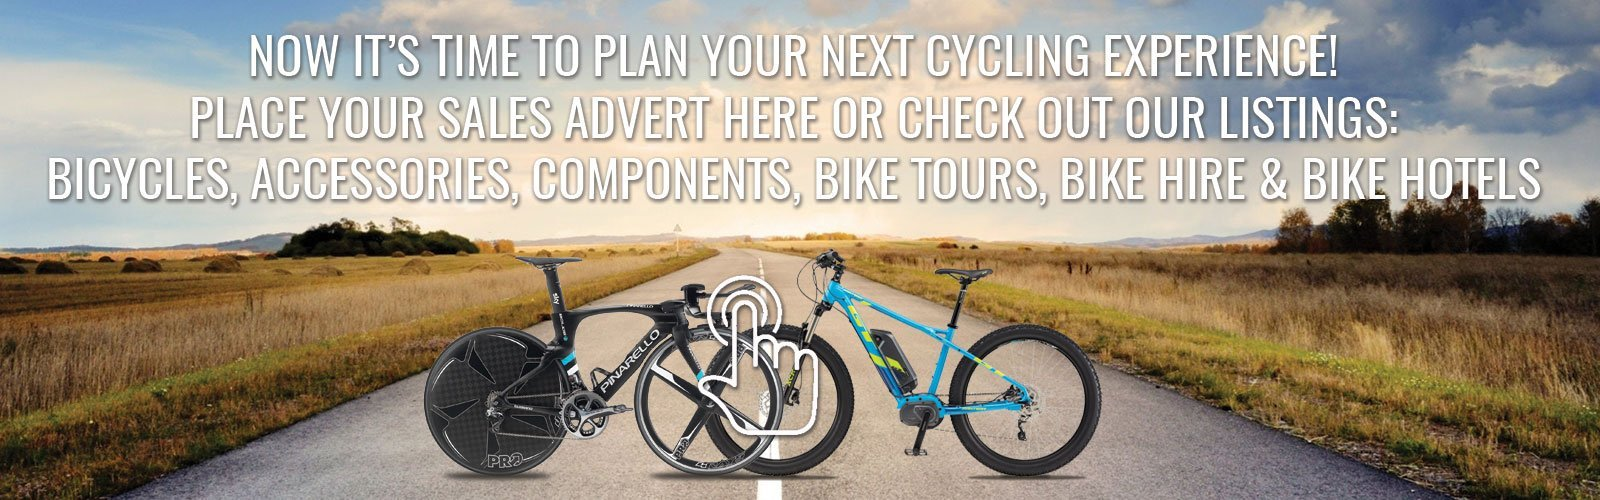 BikeChange call to action